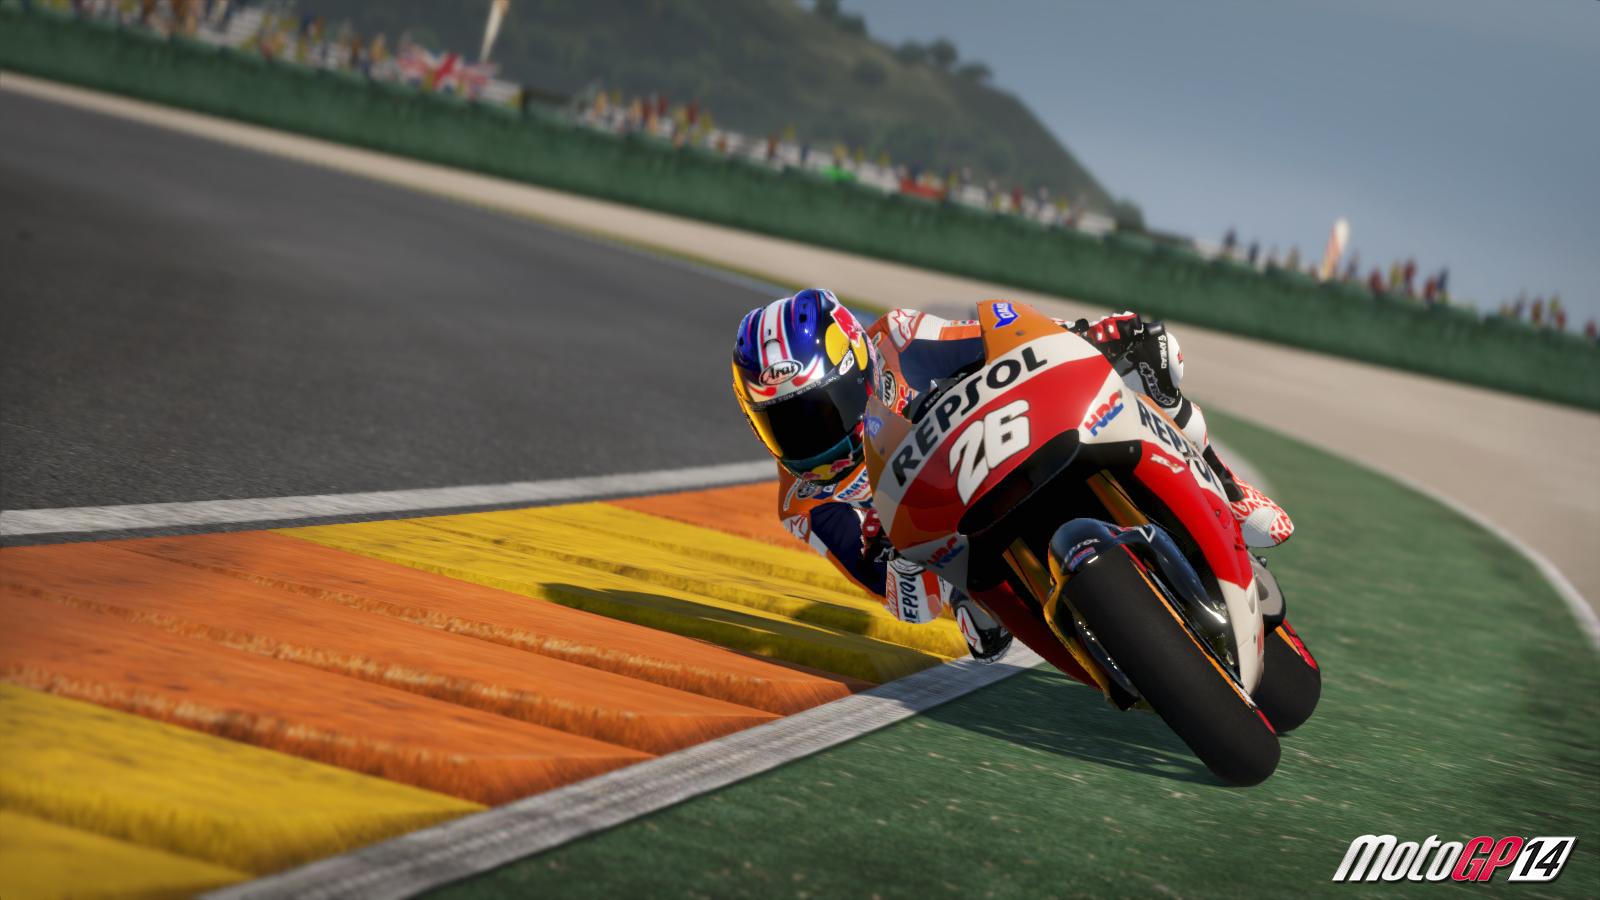 MotoGP 14 Multilenguaje ESPAÑOL XBOX 360 (Región NTSC-U/PAL) 12